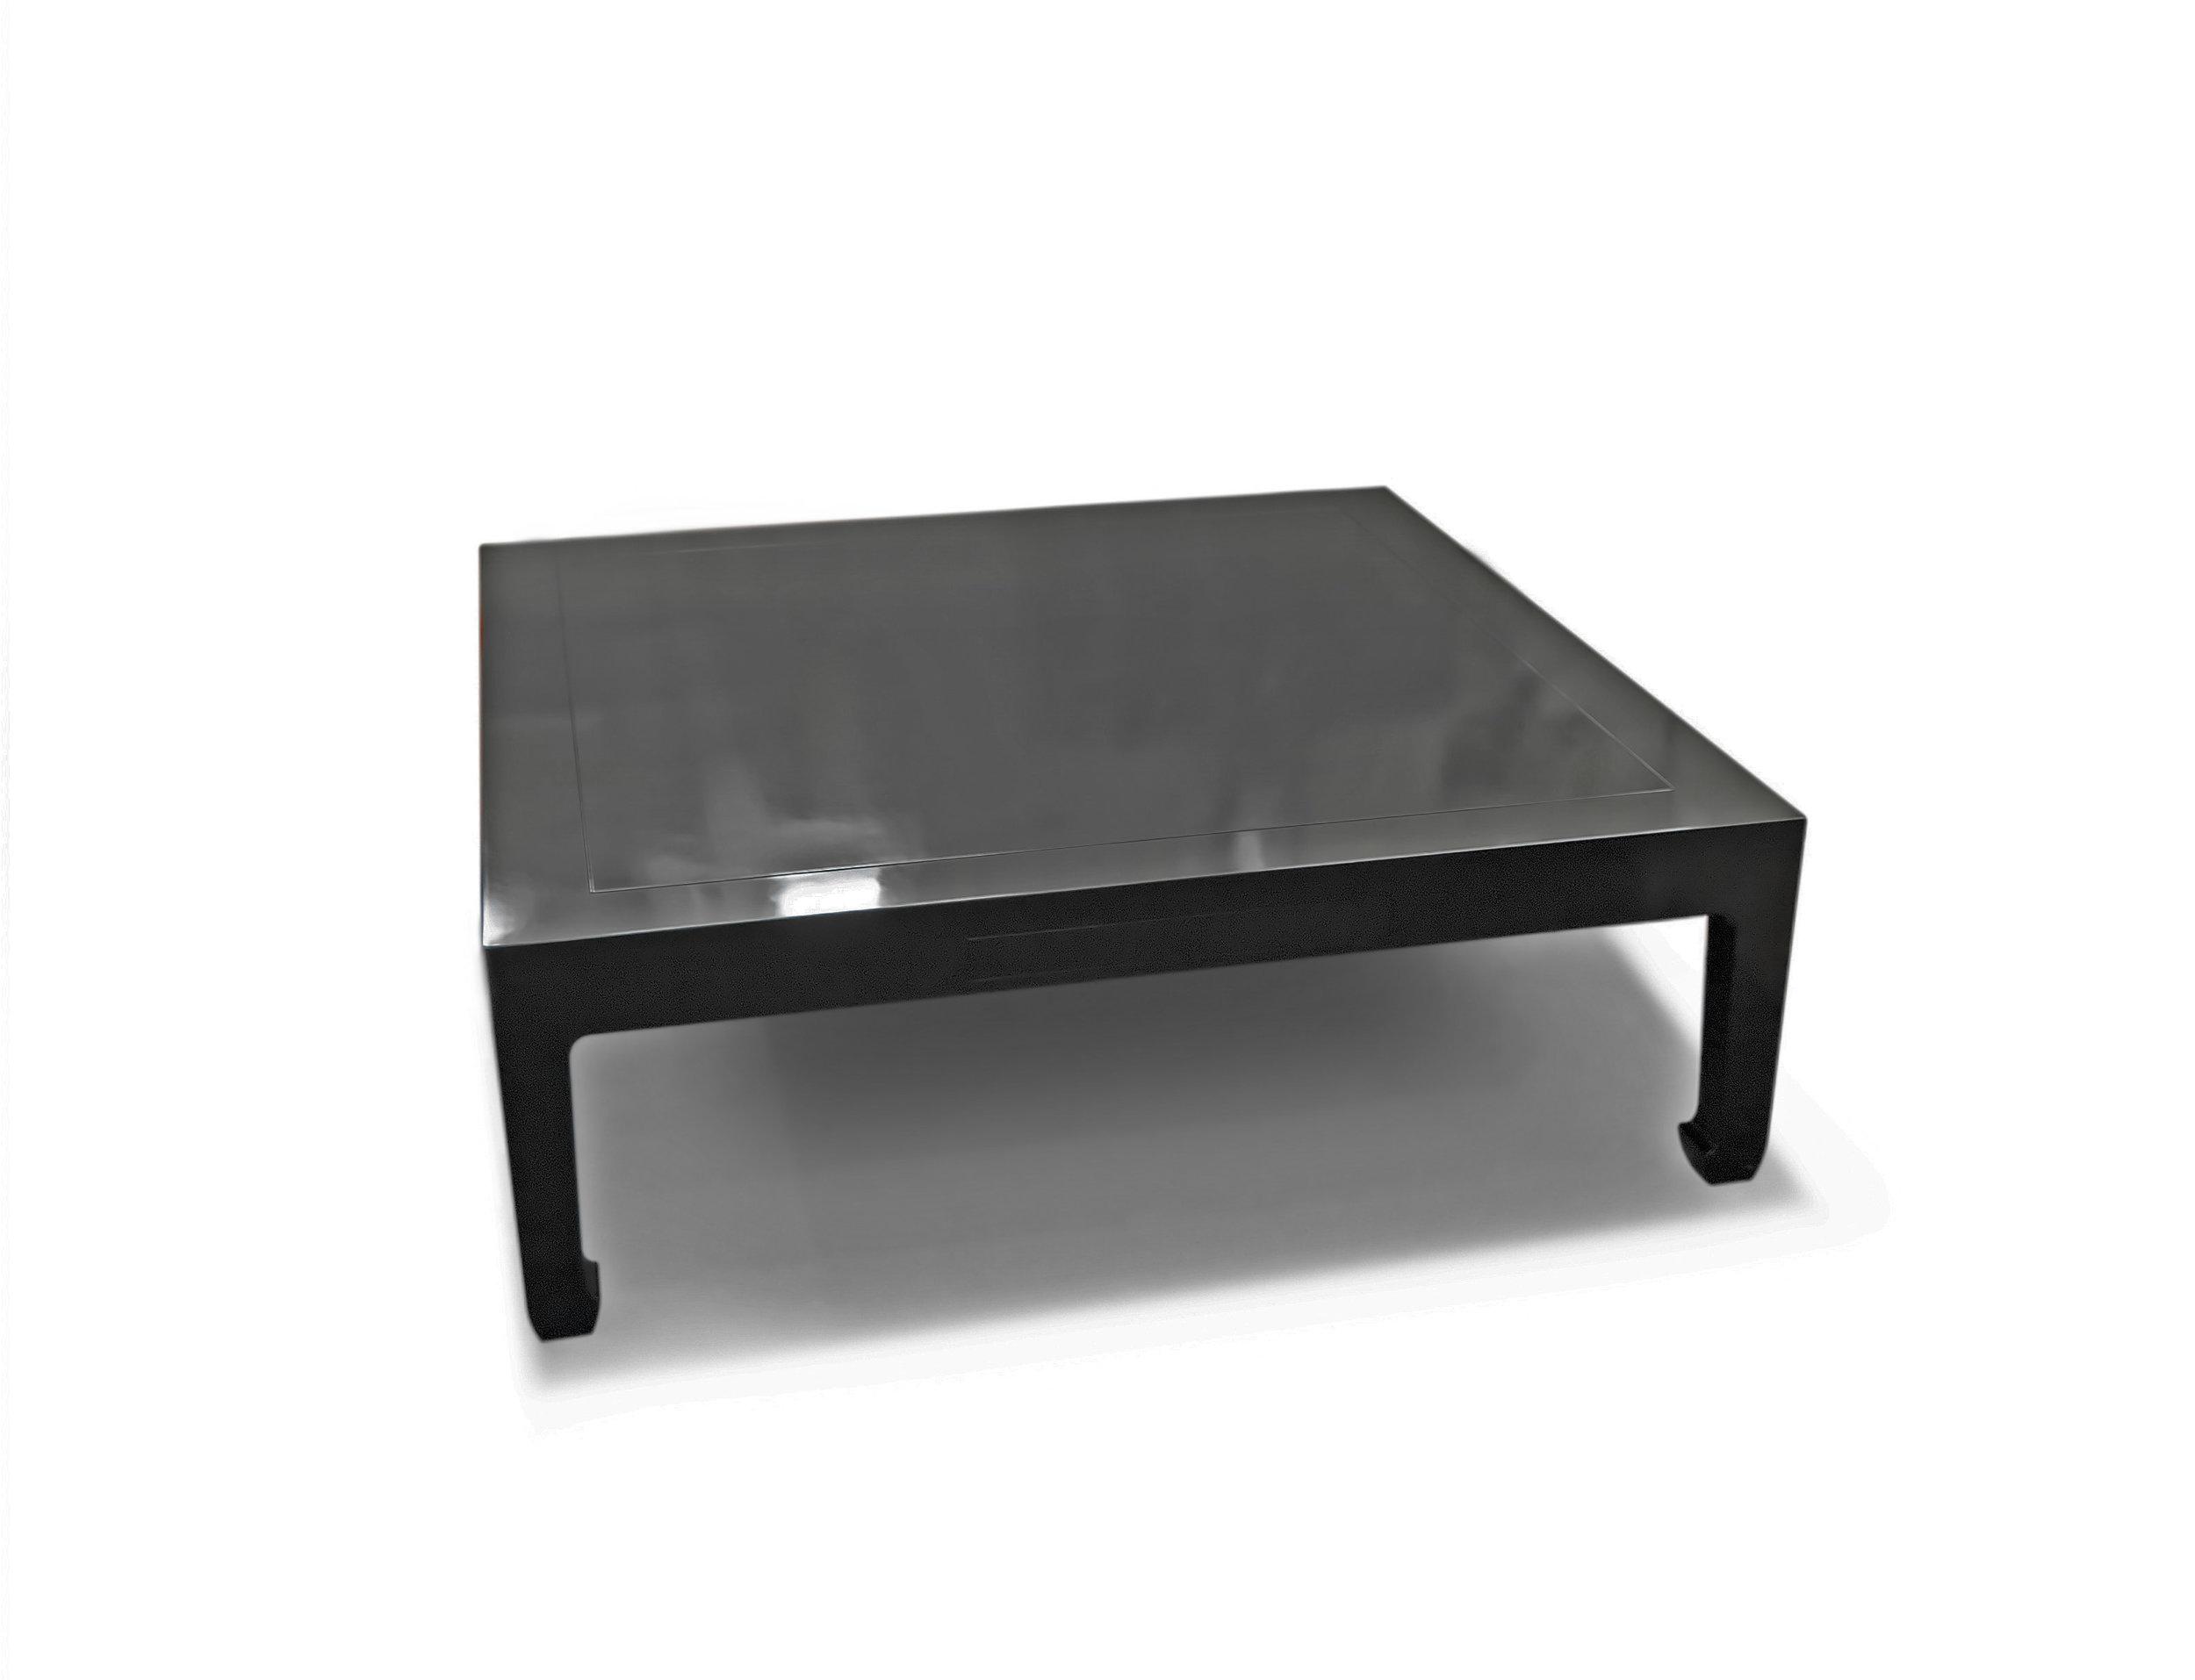 ....bespoke Chinese ming style furniture : coffee table ..特别定制中式明式家具 : 咖啡台....